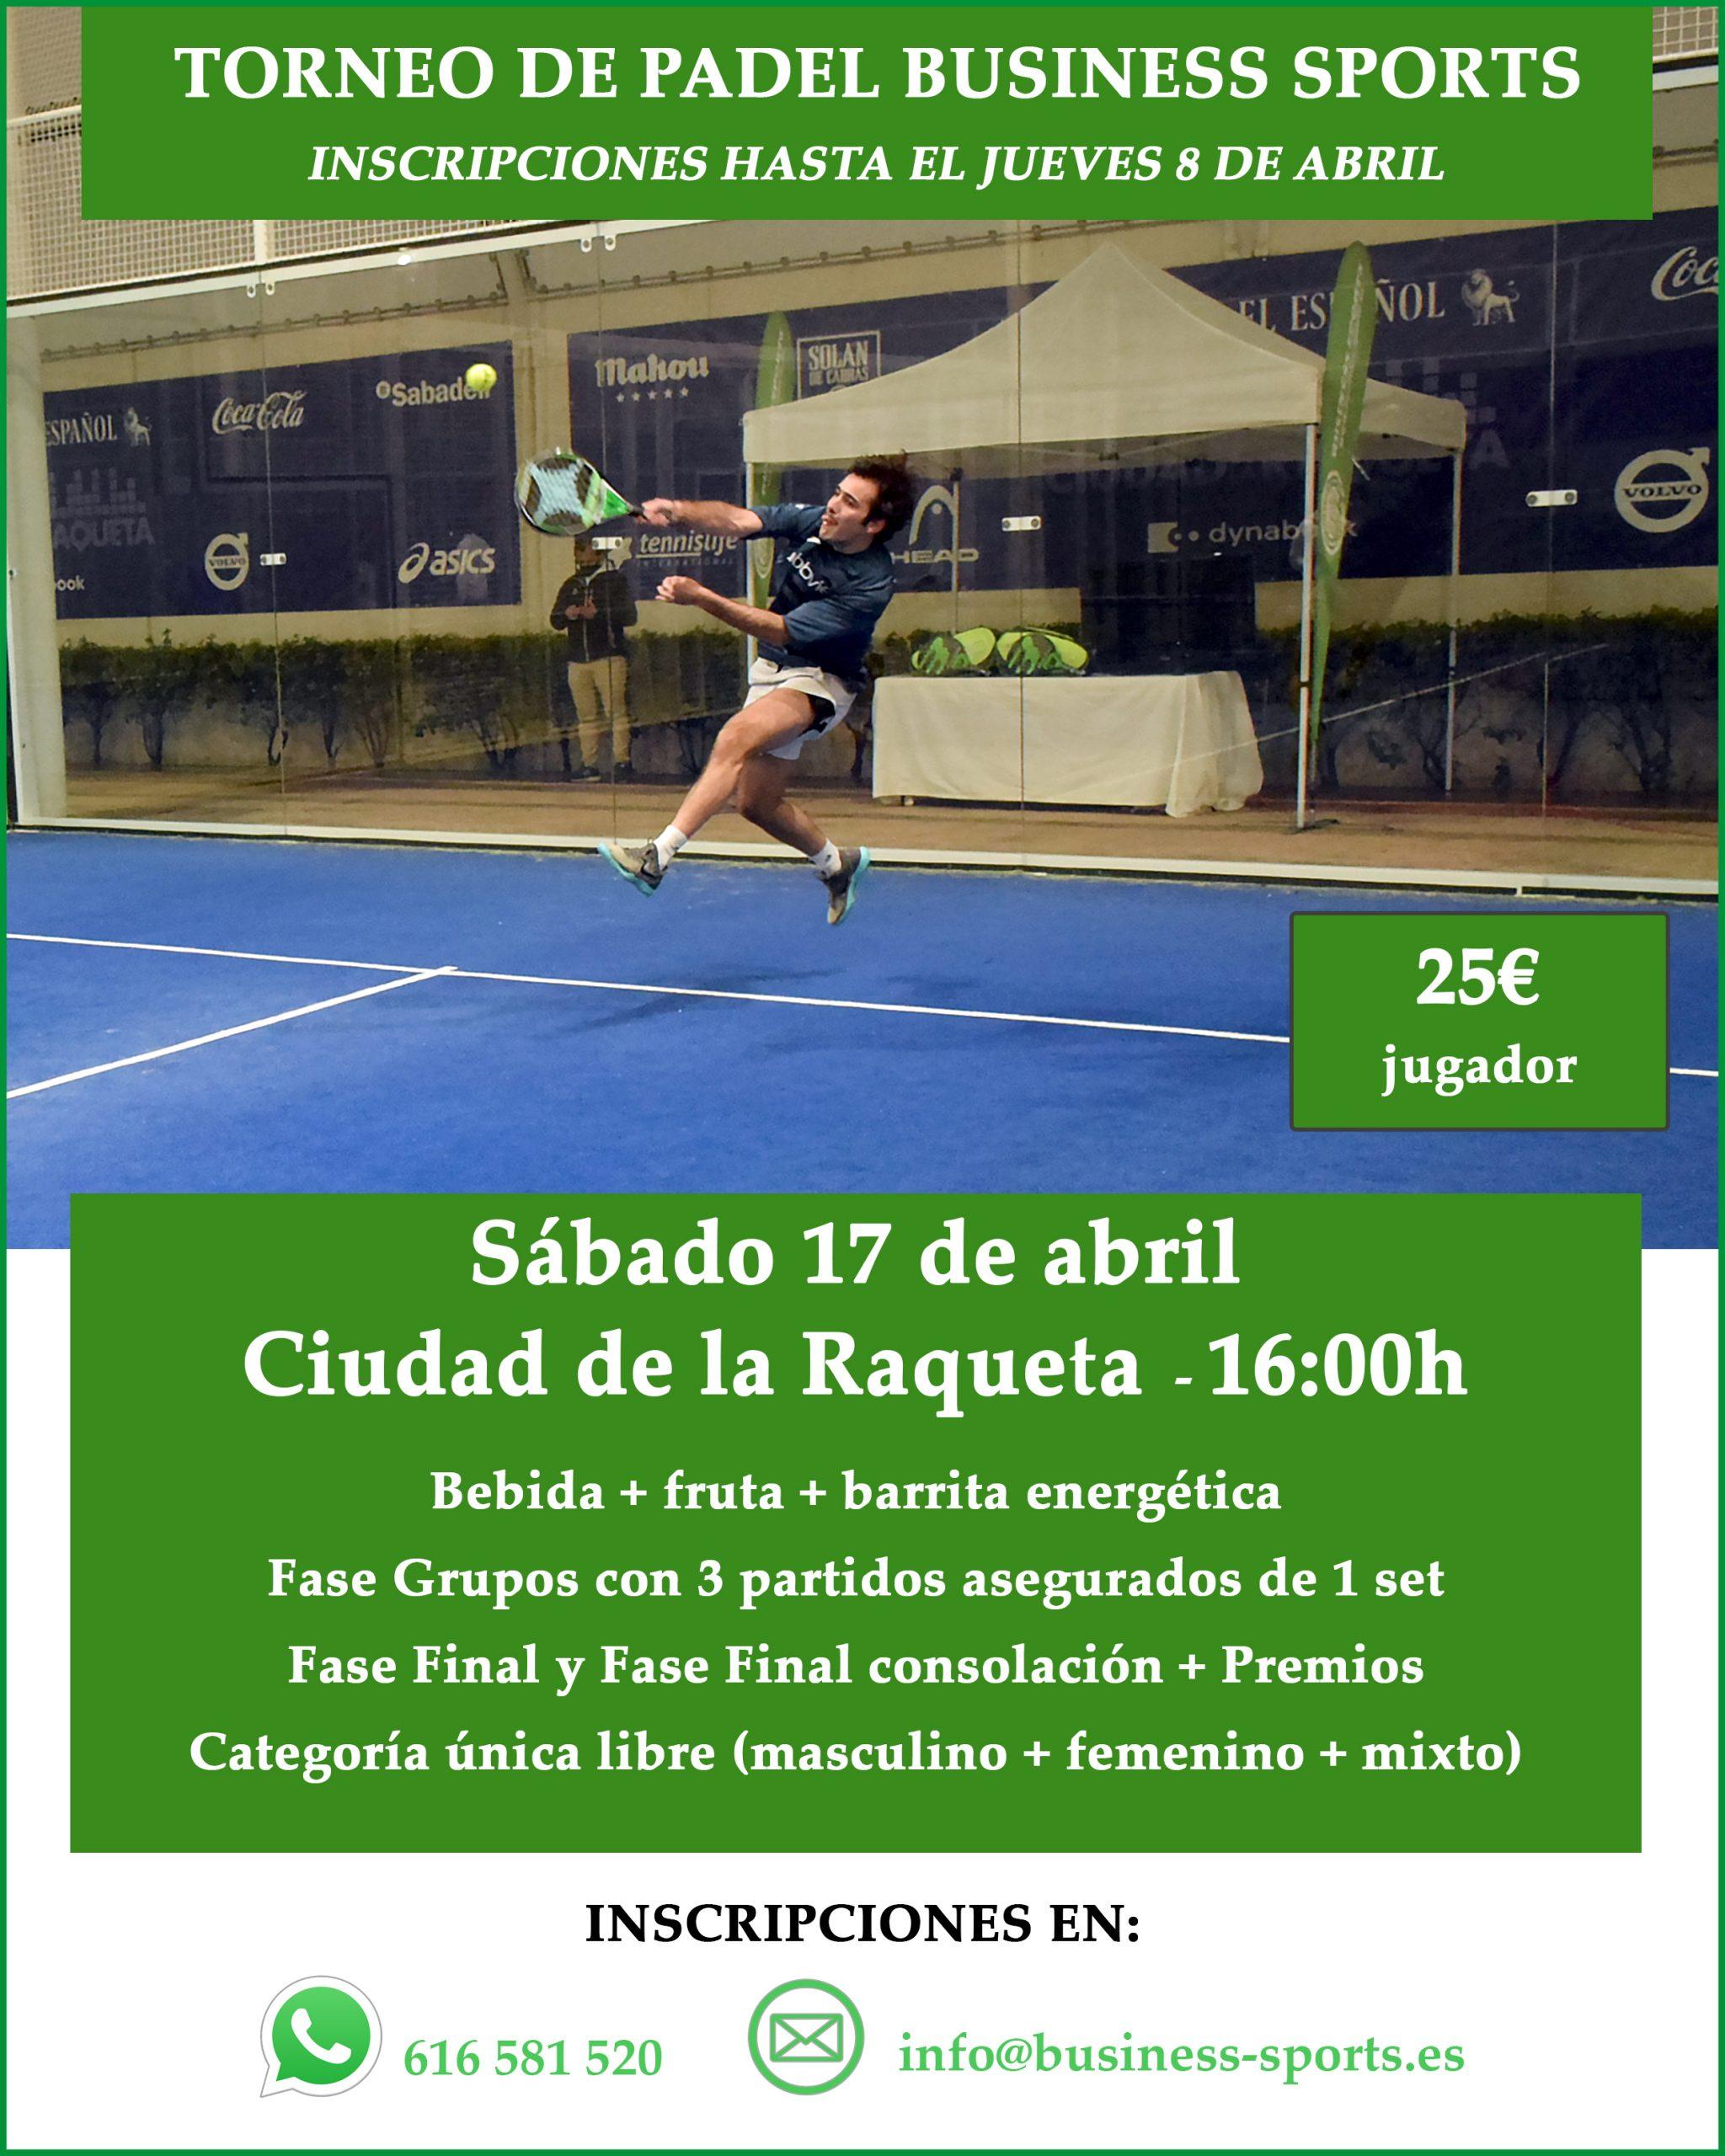 Torneo de Padel 17 de abril. ¡Apúntate!